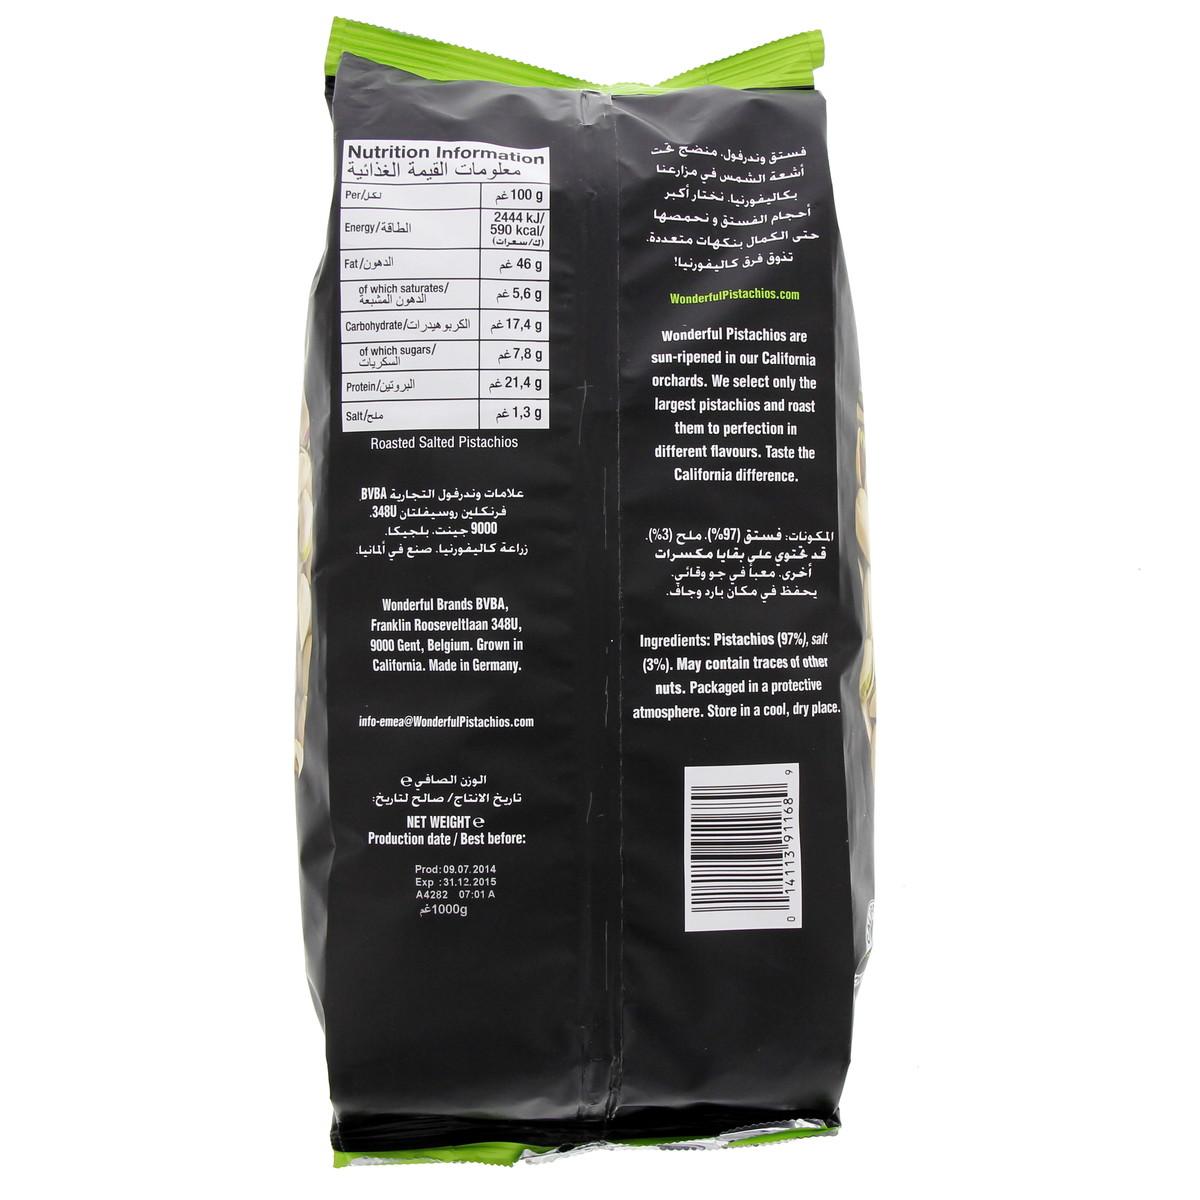 Buy Wonderful Pistachios Roasted & Salted 1kg - Nuts